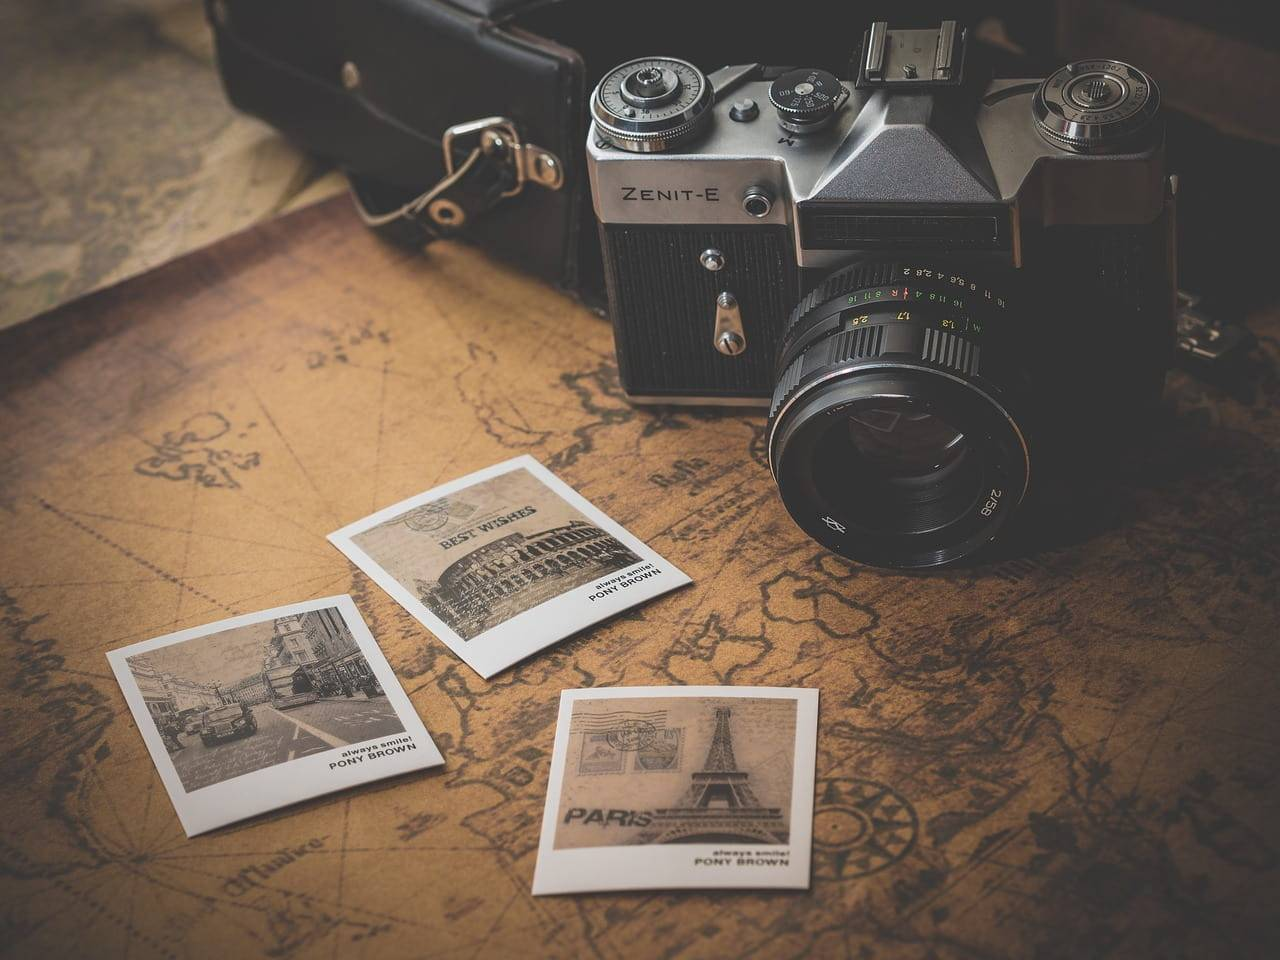 Выбор фотоаппарата и объектива для путешествий